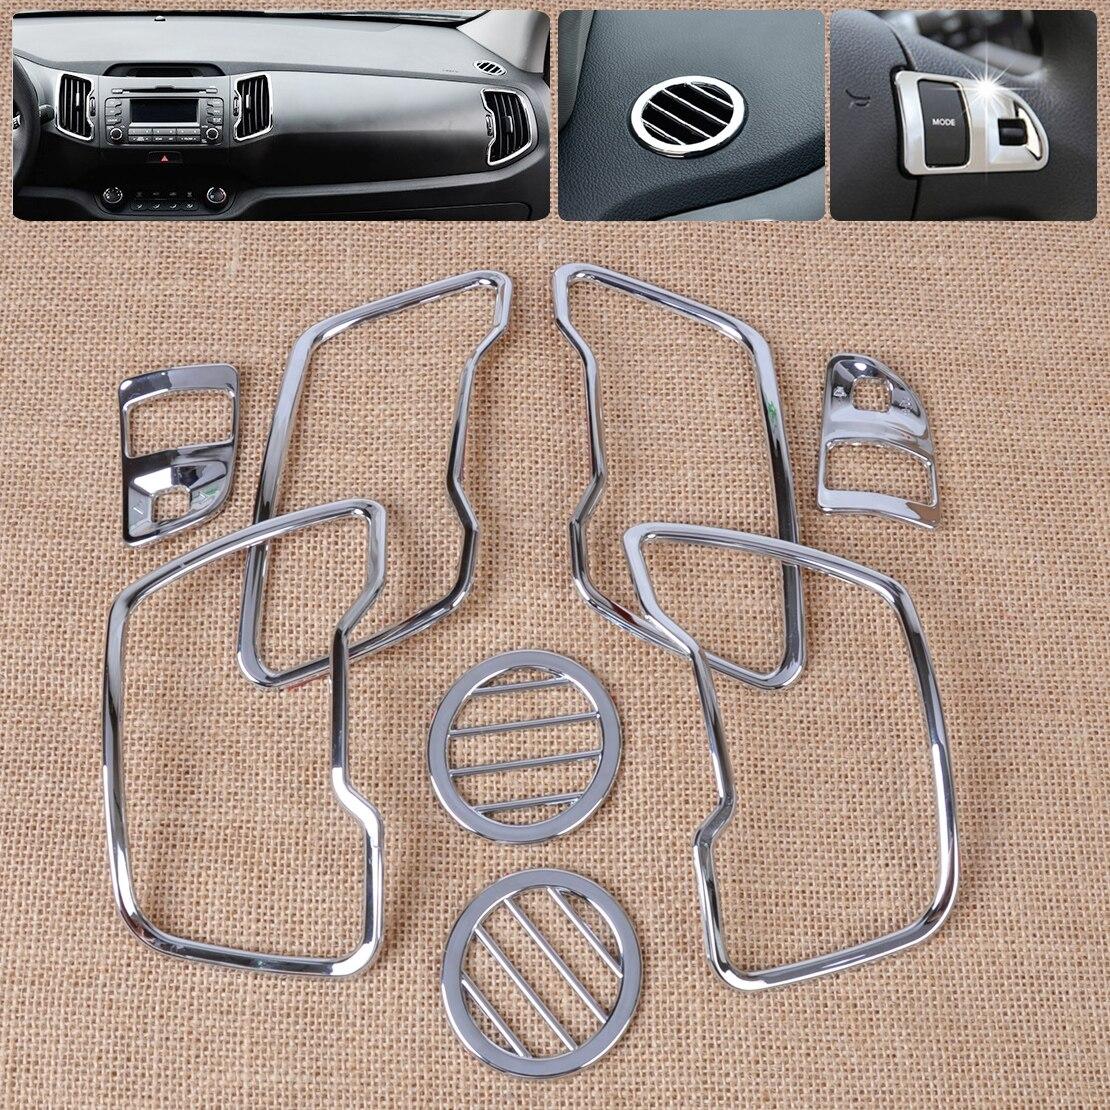 beler Silver 8pcs Chrome Steering Wheel + Air Vent Cover Trim Kit Car Accessories for Kia Sportage R 2011 2012 2013 2014 2015